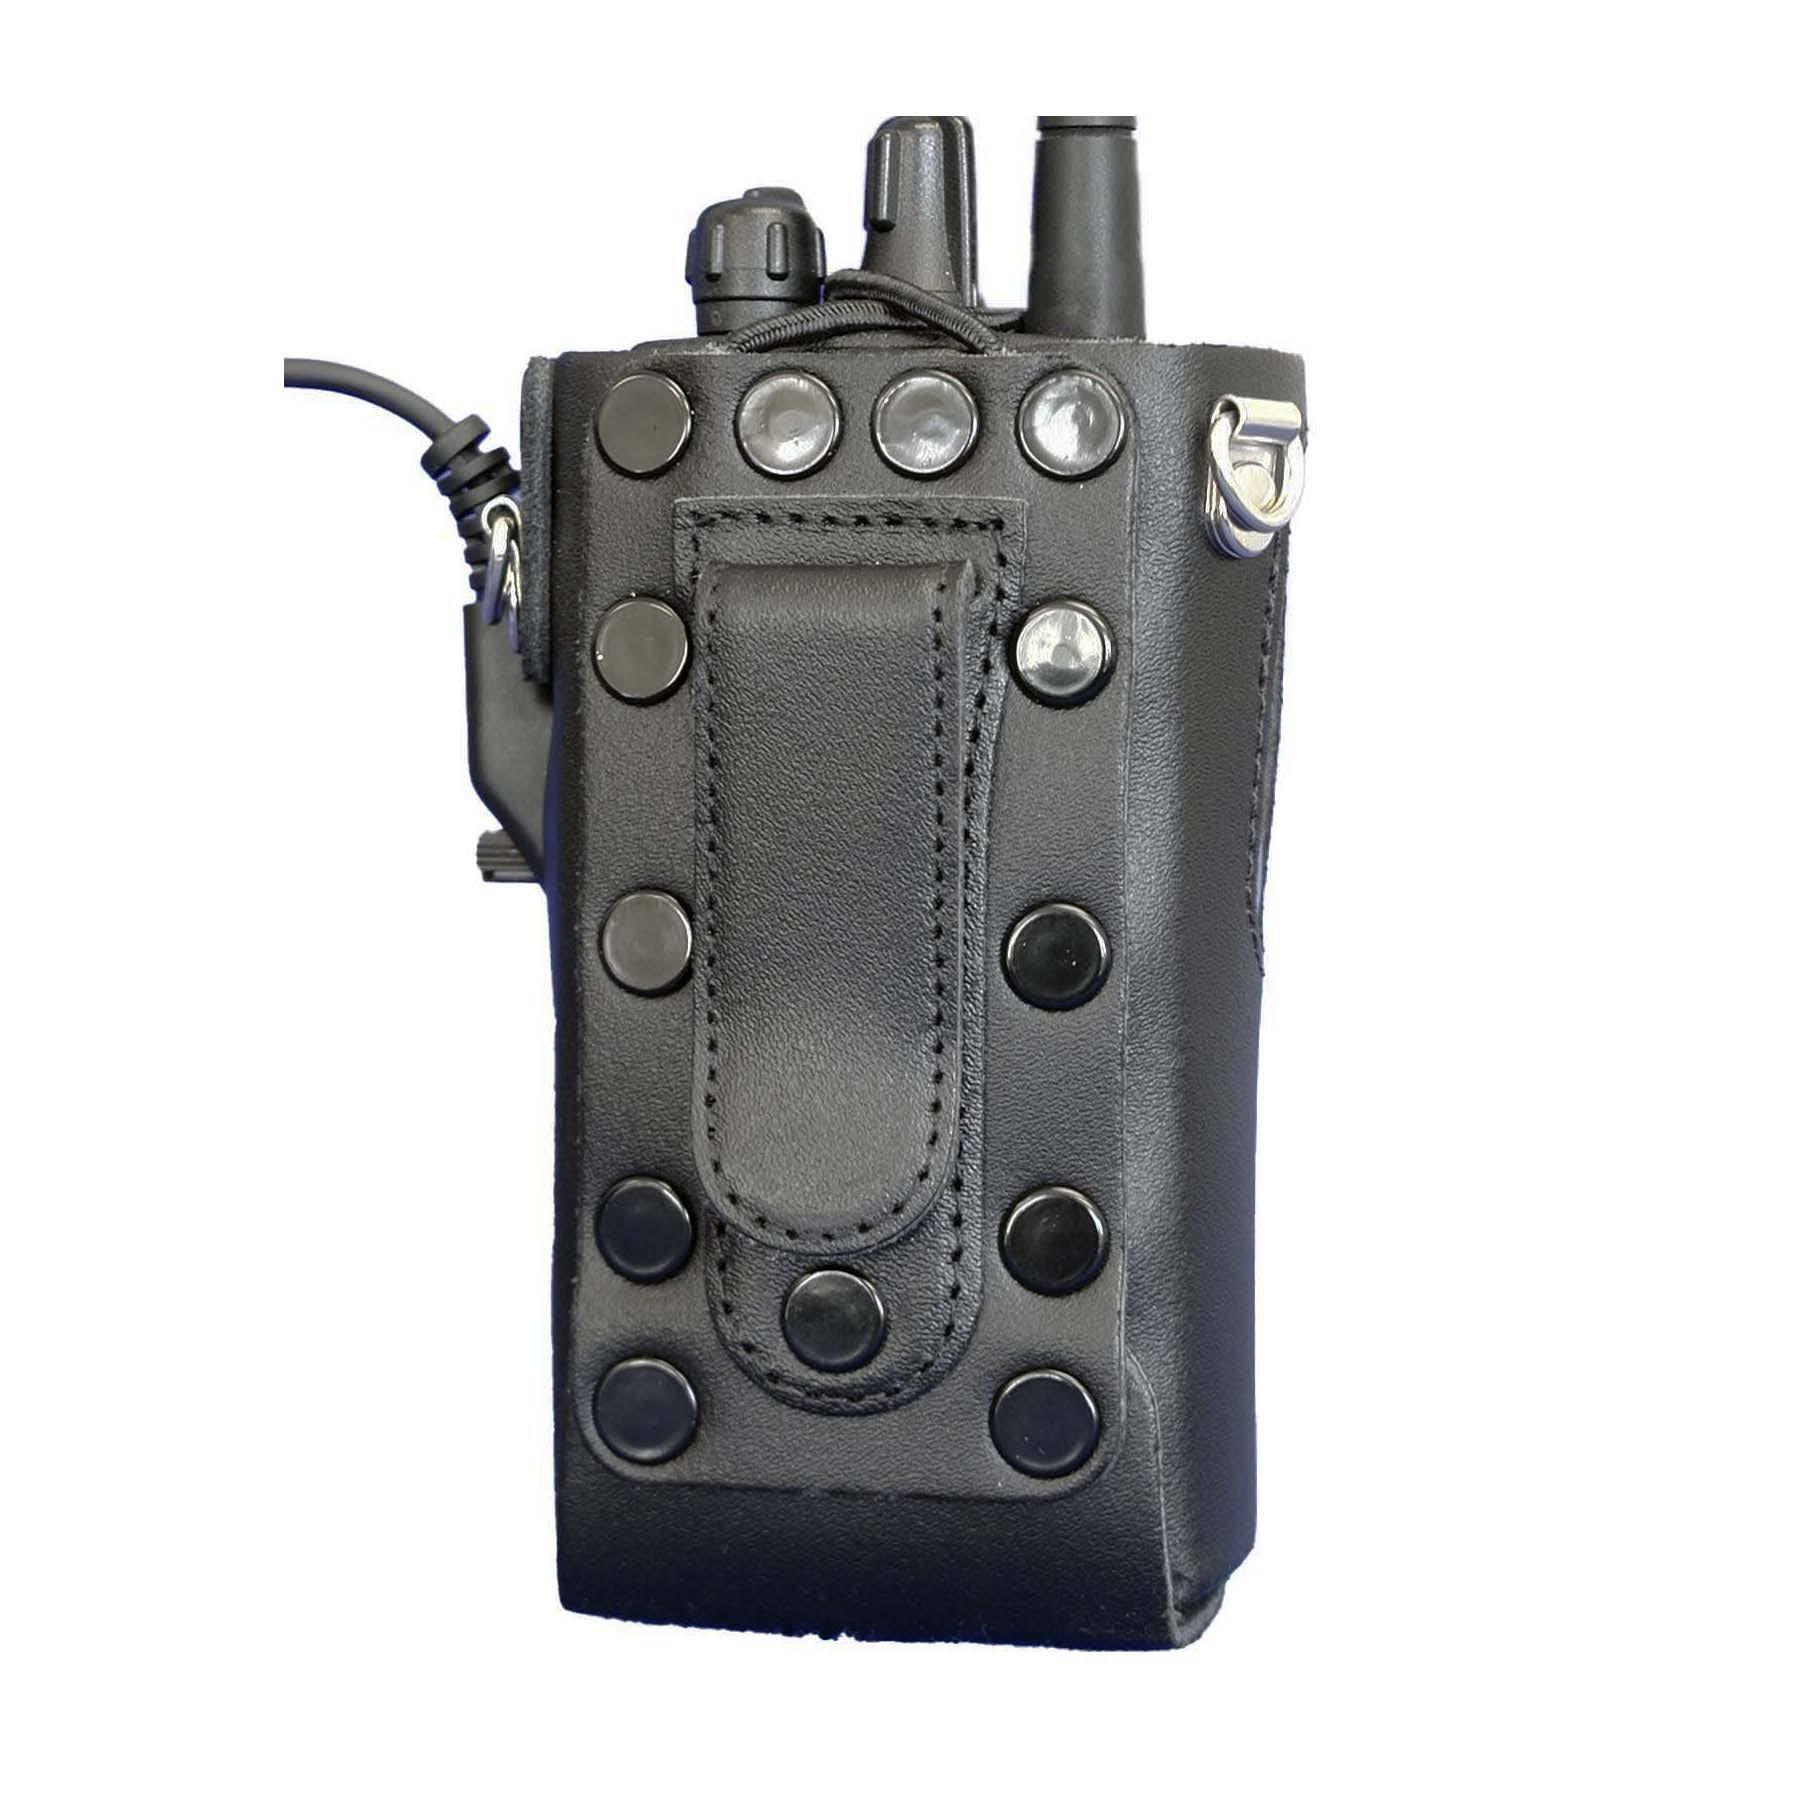 Vertex VX160 Leather Radio Case